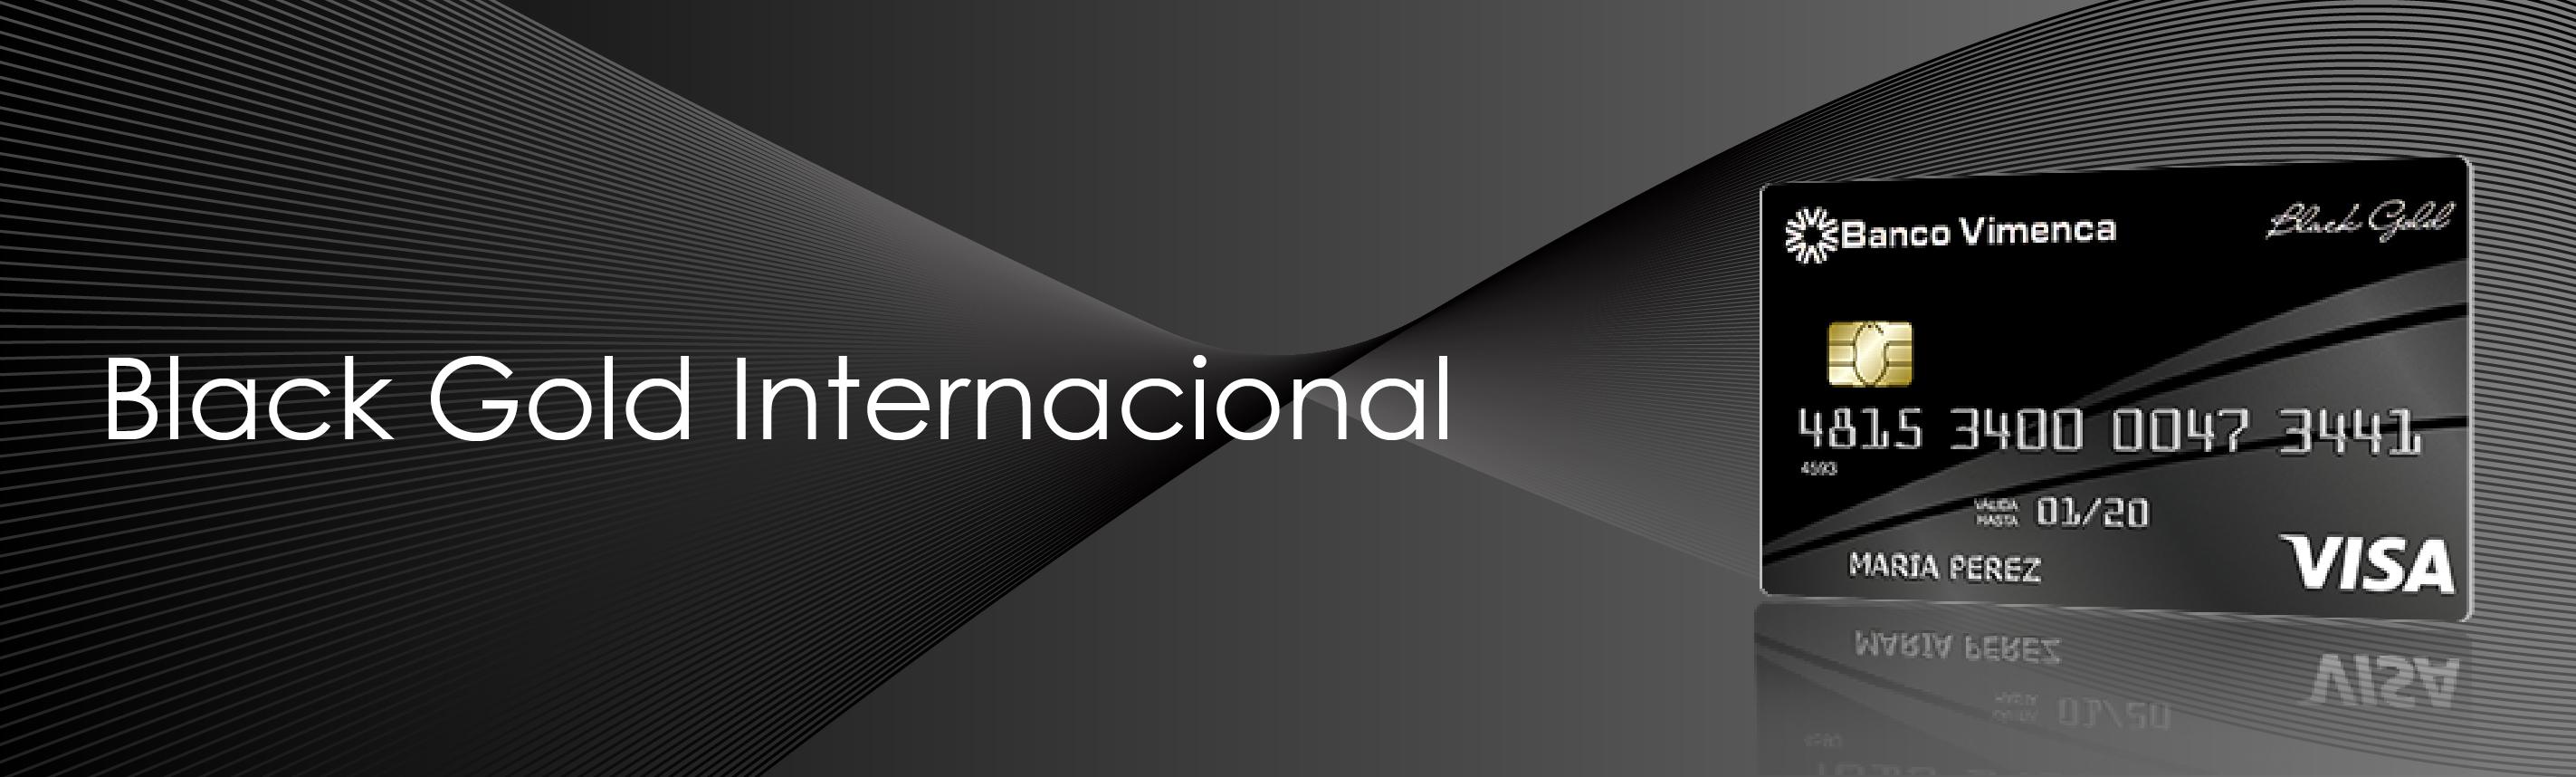 Tarjeta de Crédito VISA Black Gold Internacional